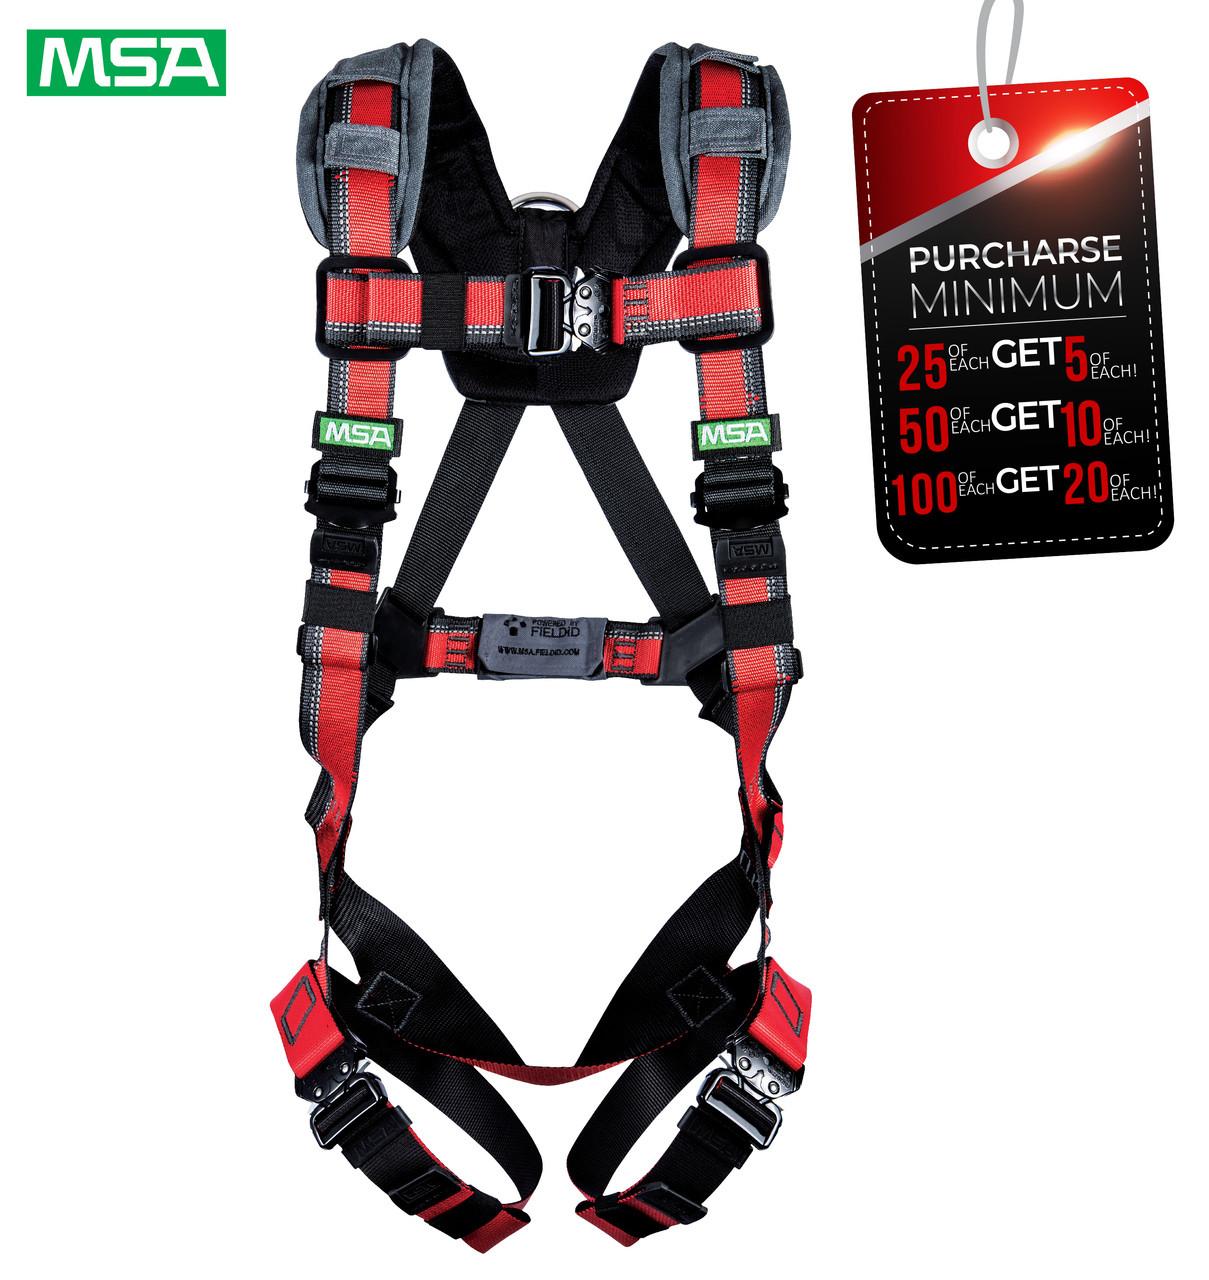 MSA 10155559 EVOTECH® Lite Harness, Back D-Ring, Quick Connect leg